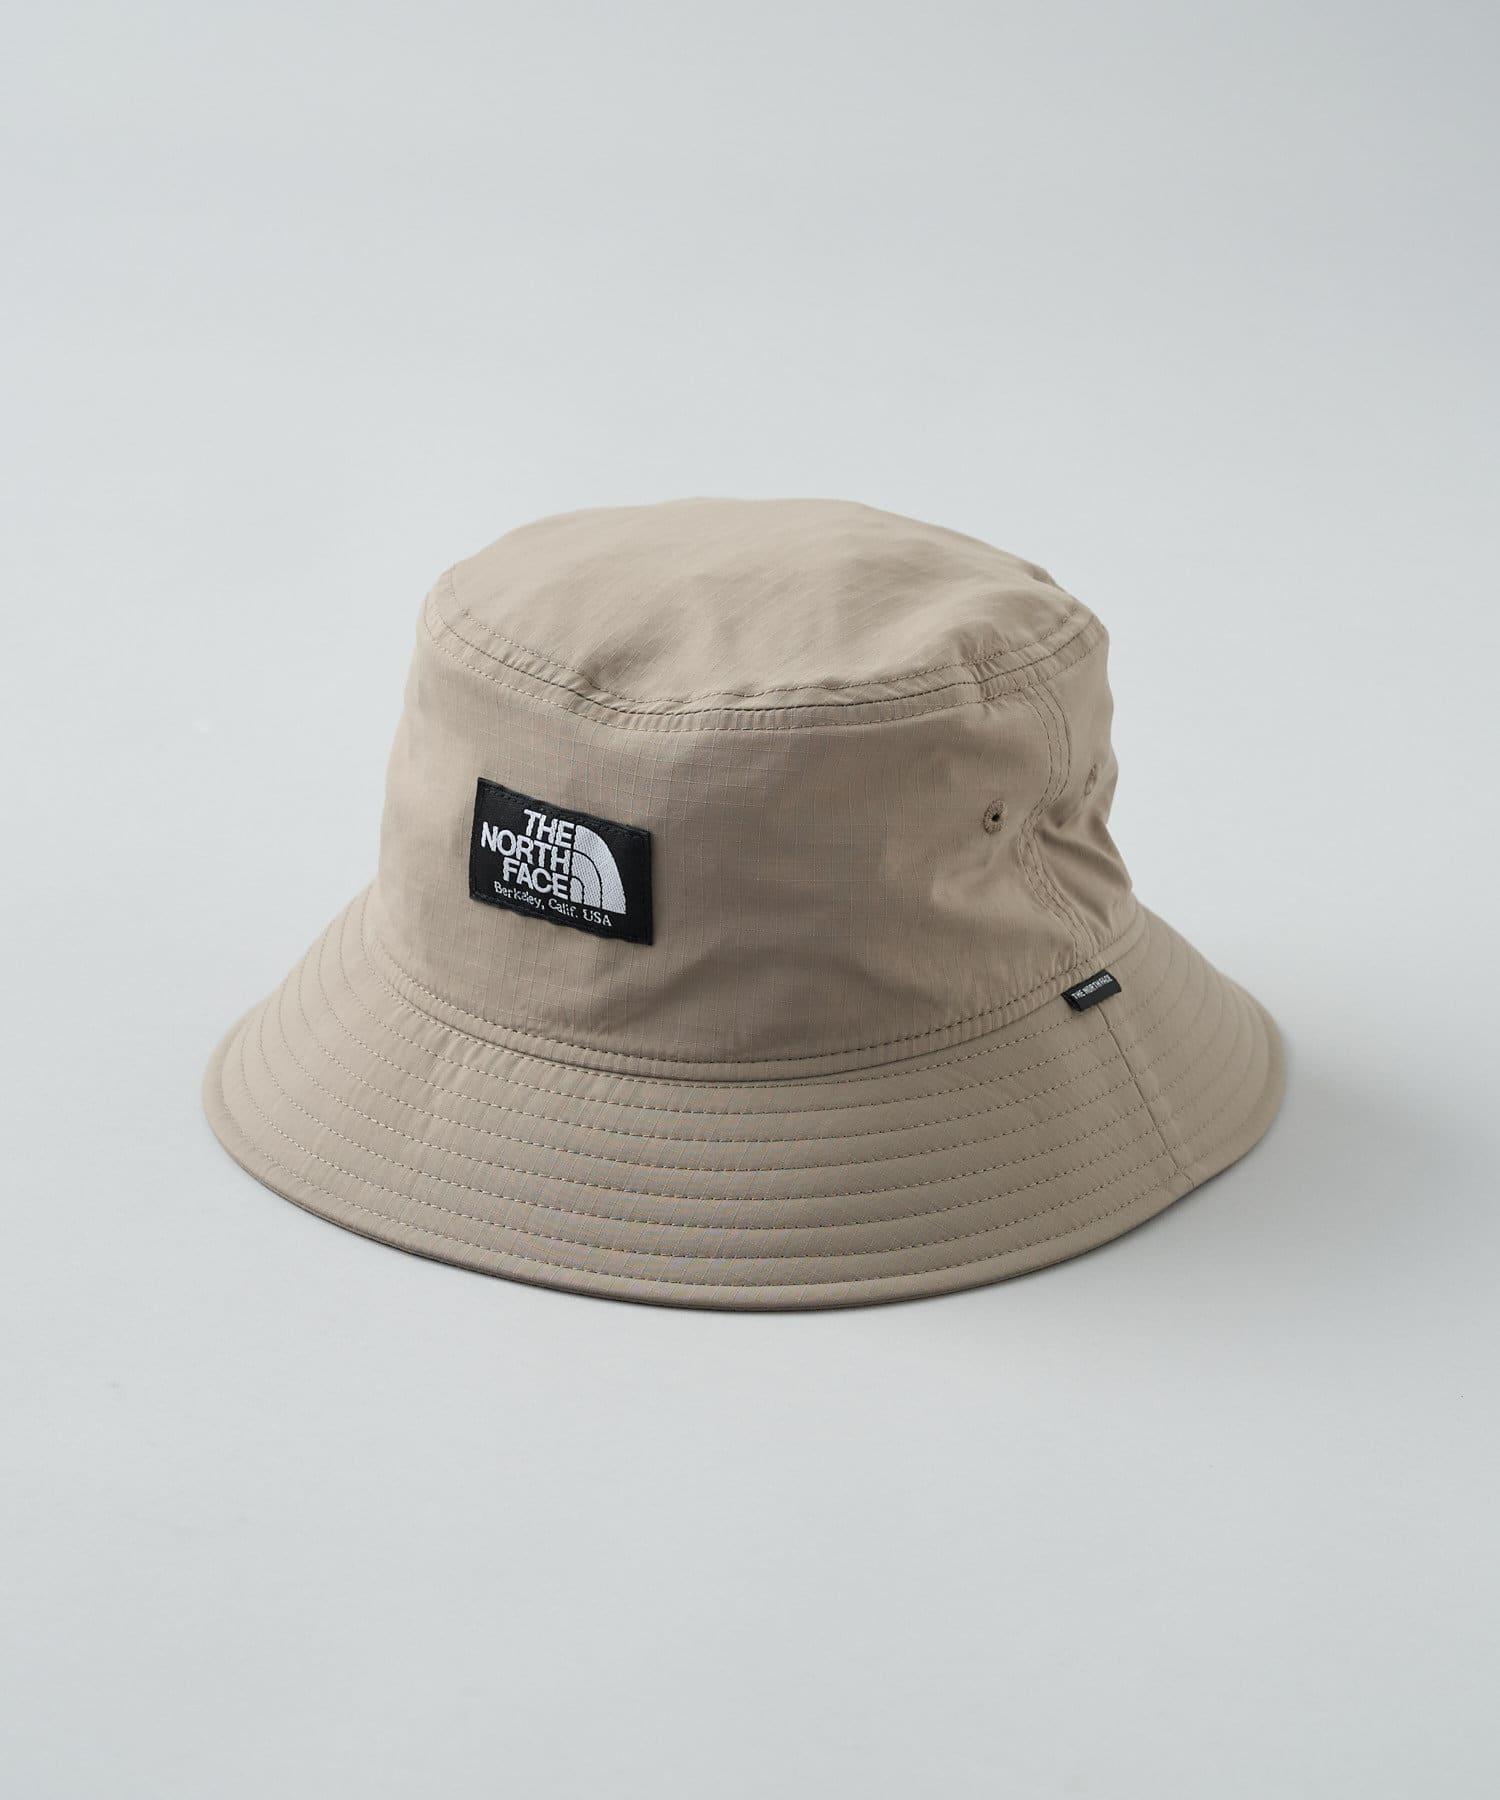 CIAOPANIC(チャオパニック) レディース 【THE NORTH FACE】Camp Side Hat/NN41906 グレー